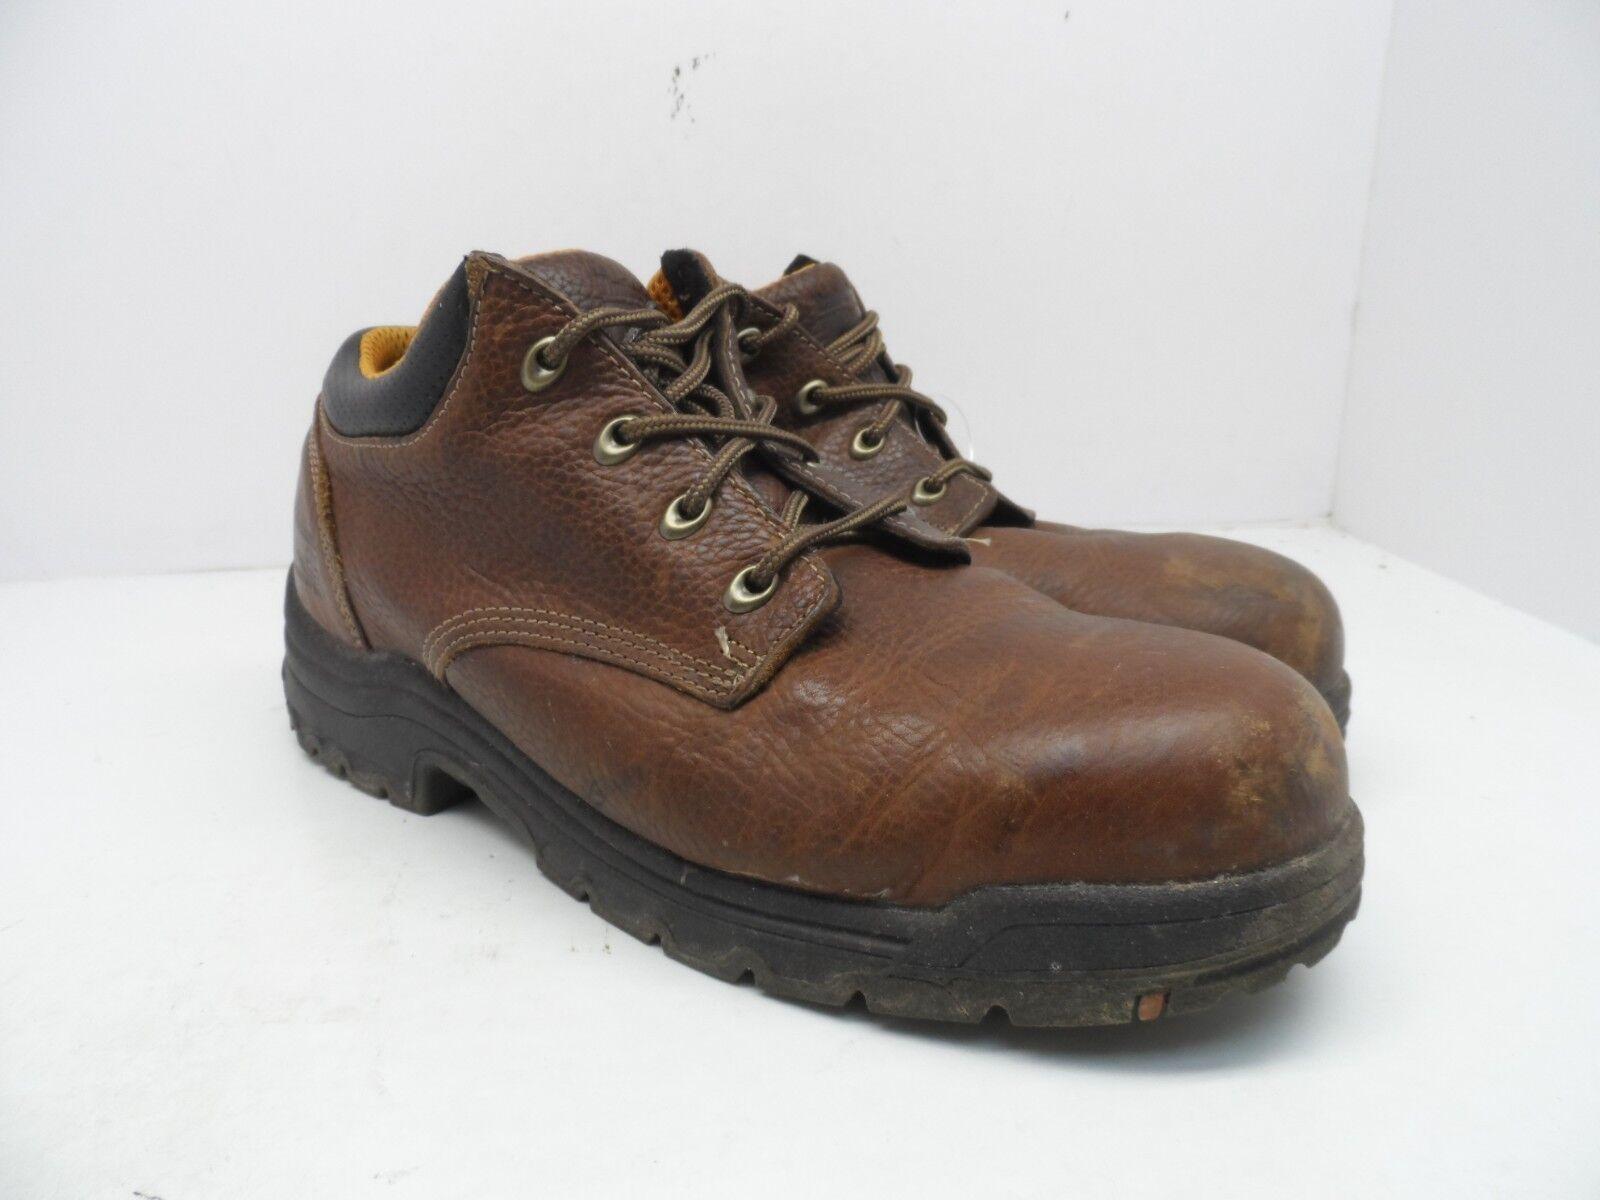 e8d8fd2172f mens size timberland boots купить с доставкой